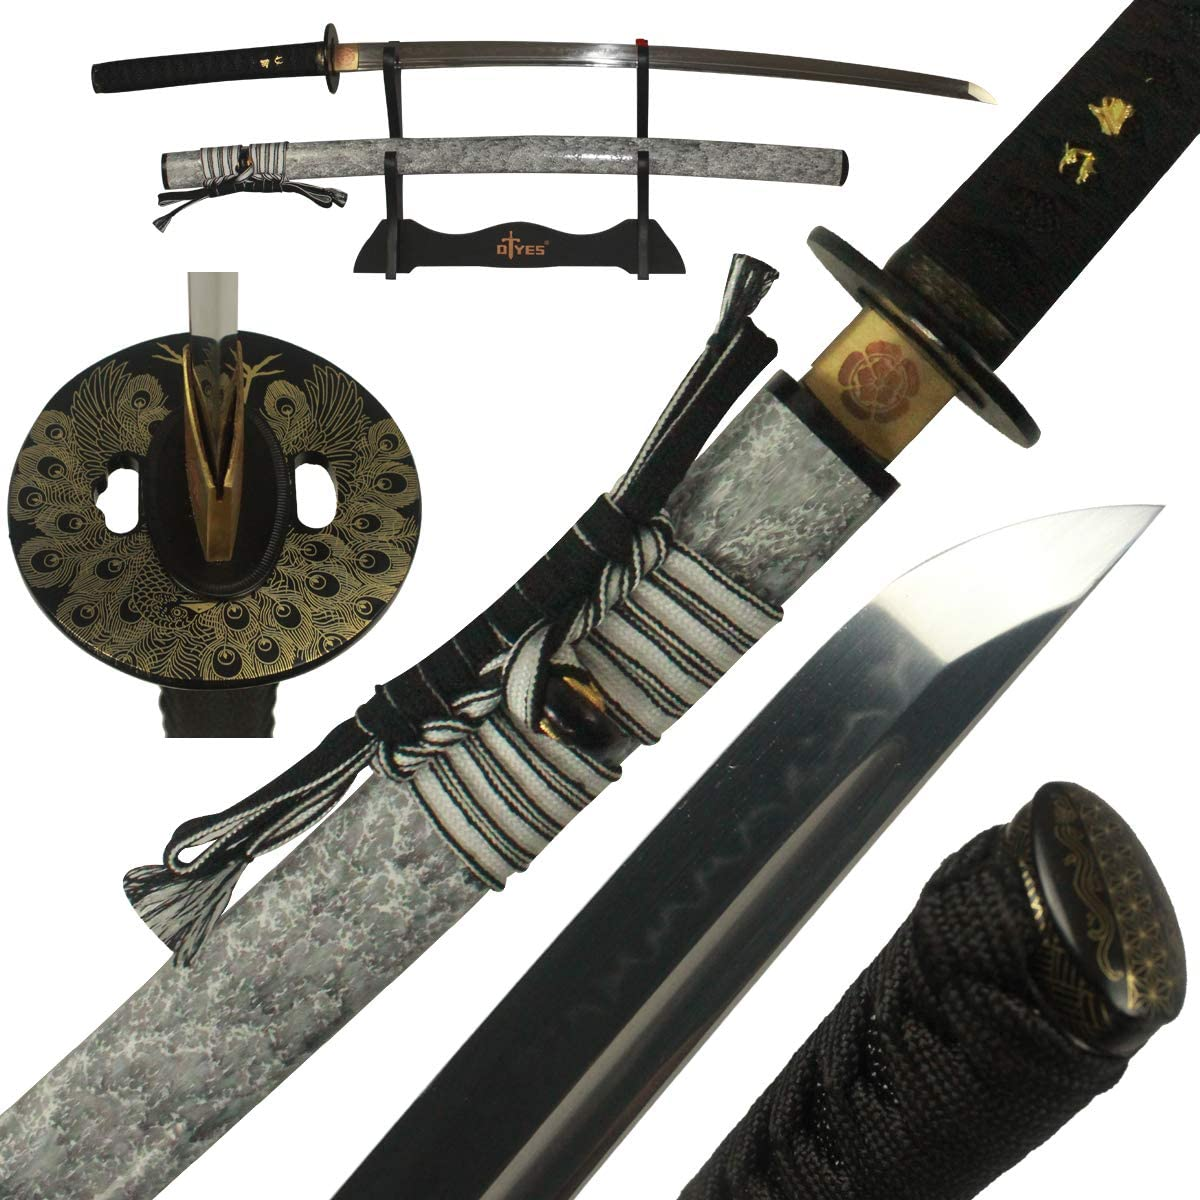 DTYES Full Handmade T10 Clay Award Tempered Sharp Sword Ja Real Katana Limited time for free shipping